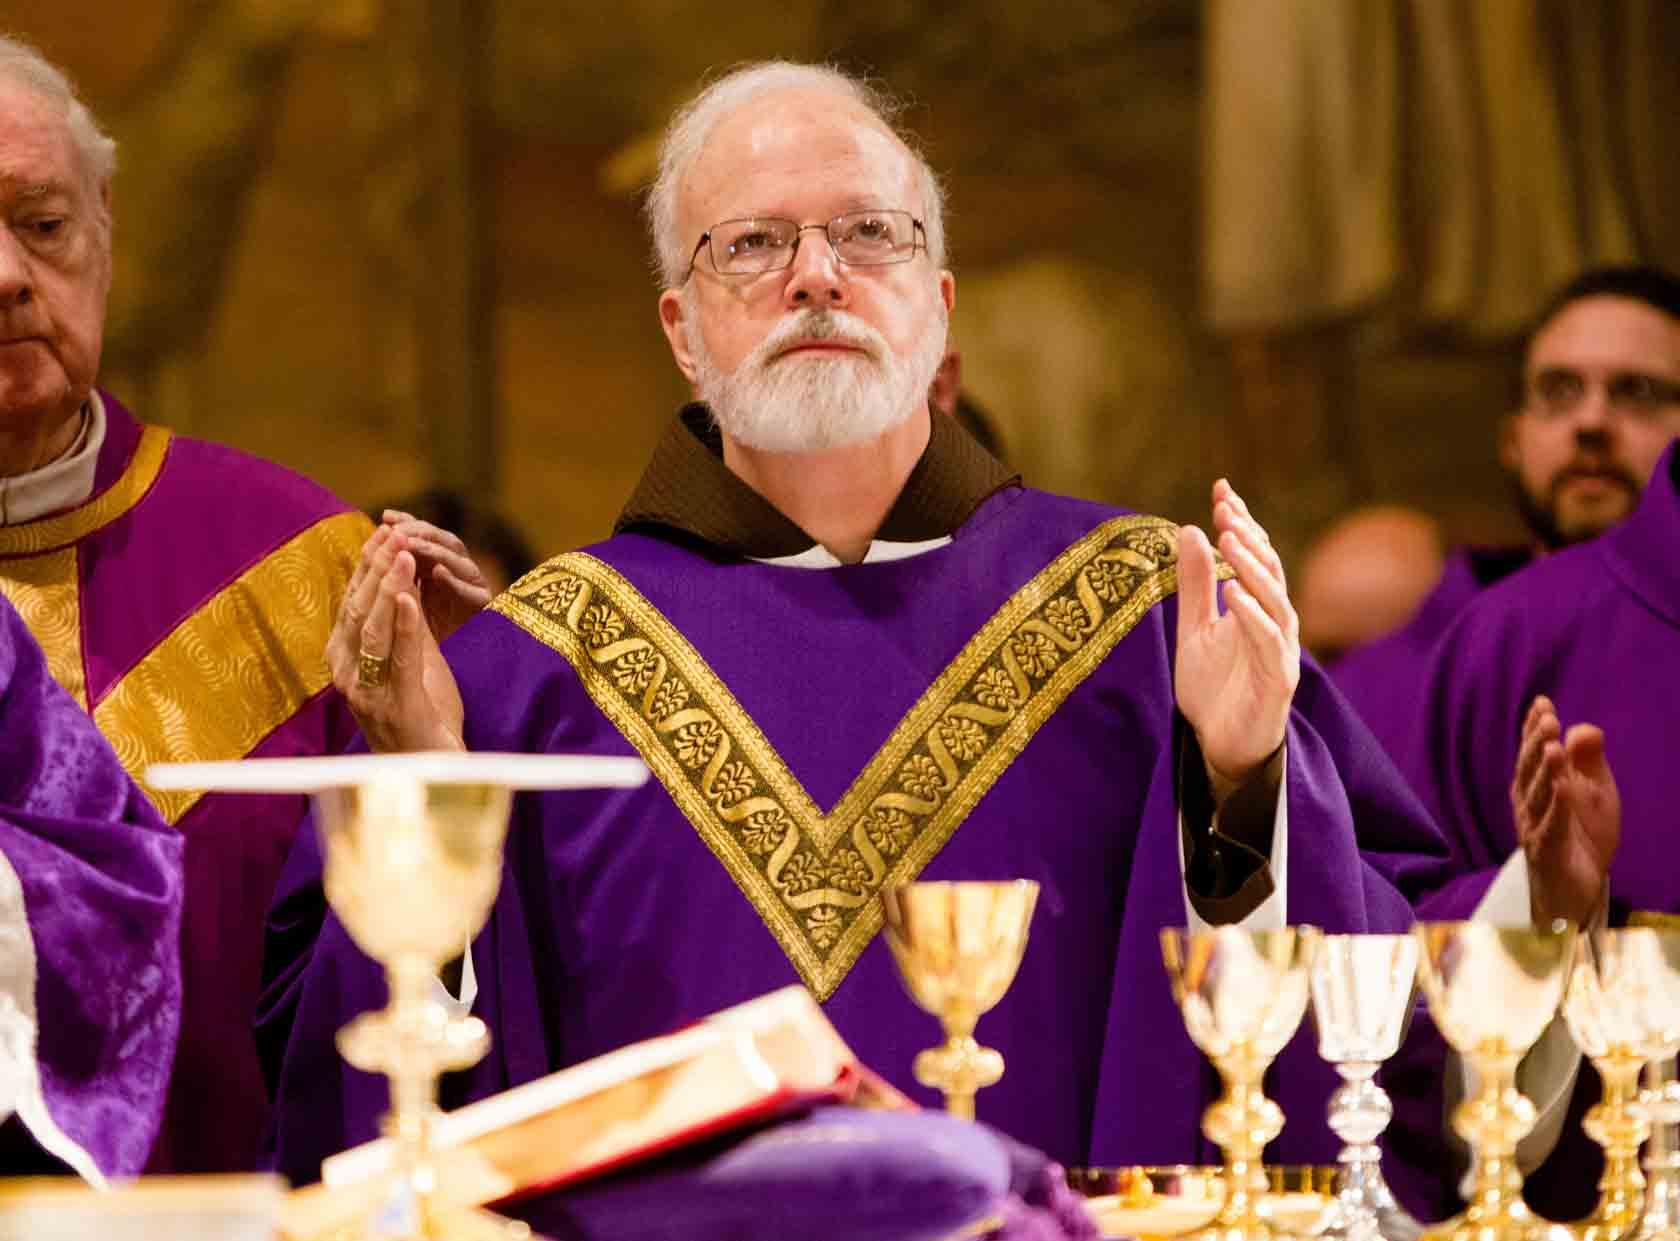 an analysis of catholic church